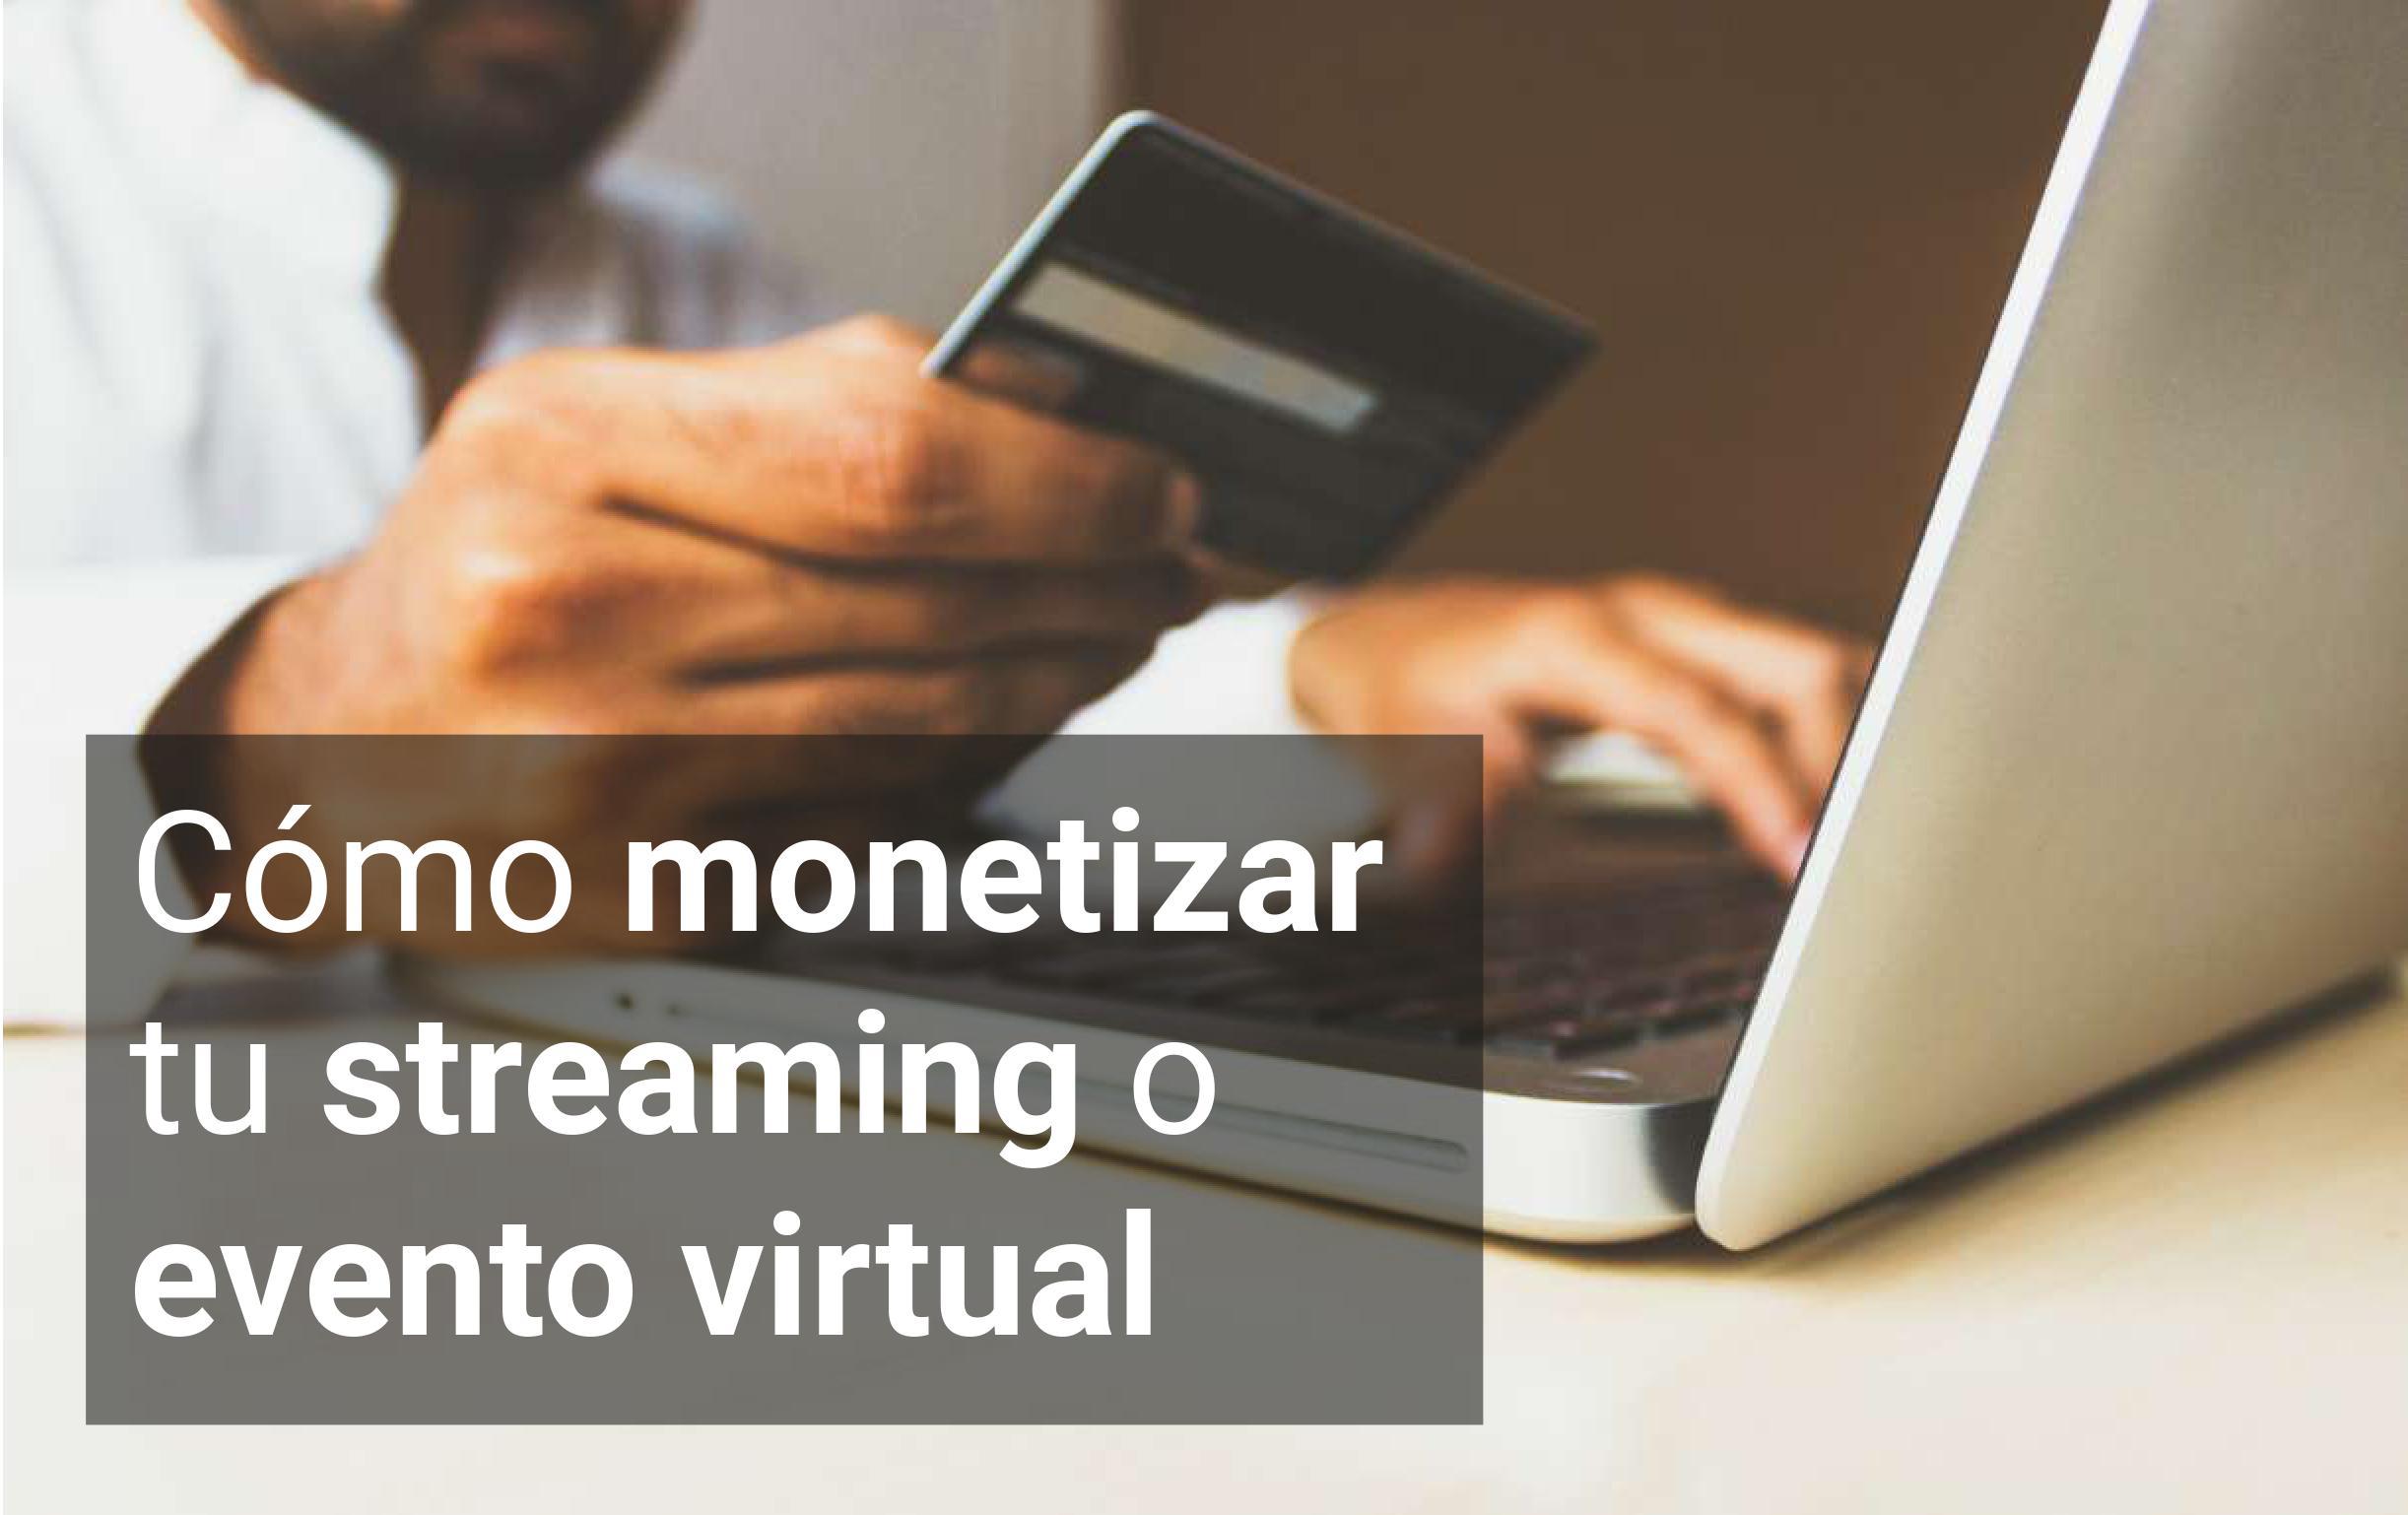 Monetizar streaming eventos virtuales